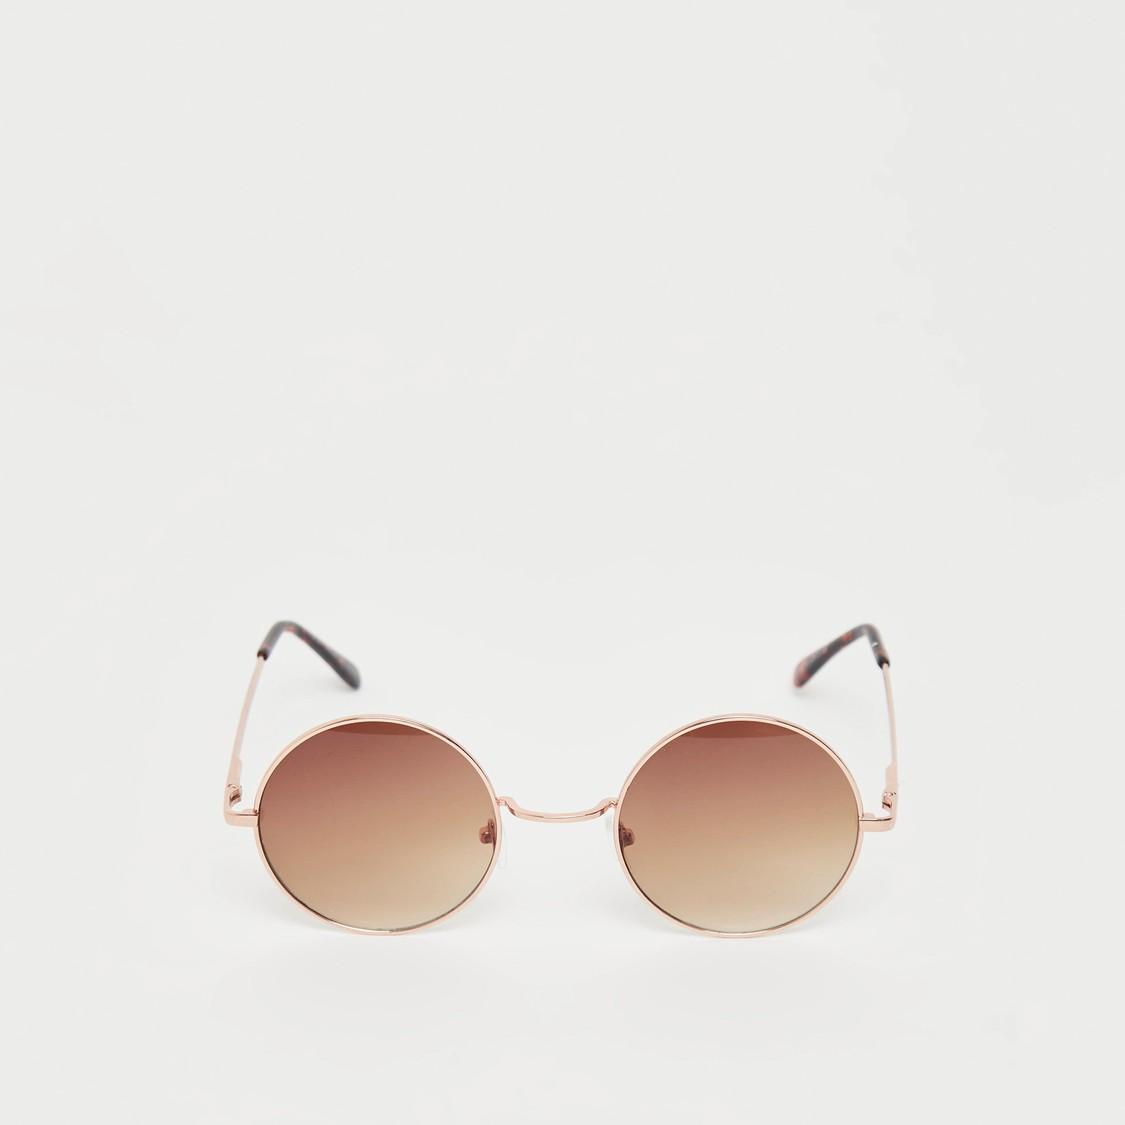 Solid Round Sunglasses